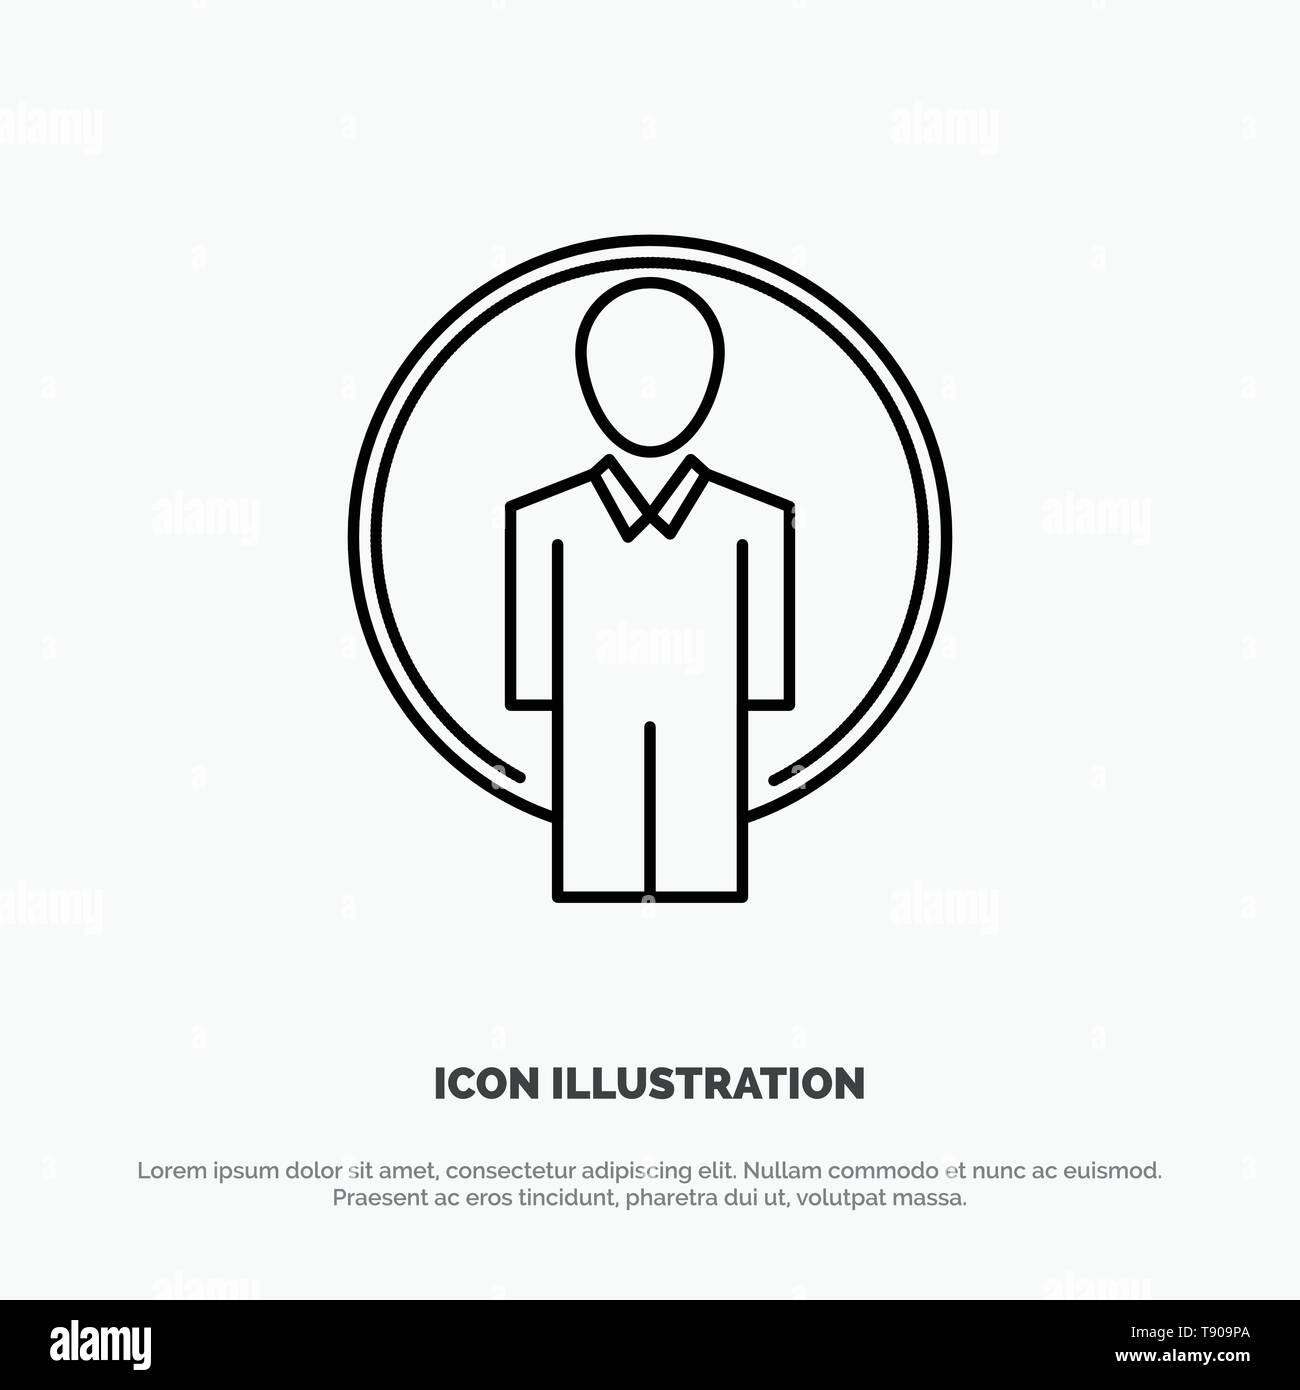 User, Id, Login, Image Line Icon Vector Stock Vector Art